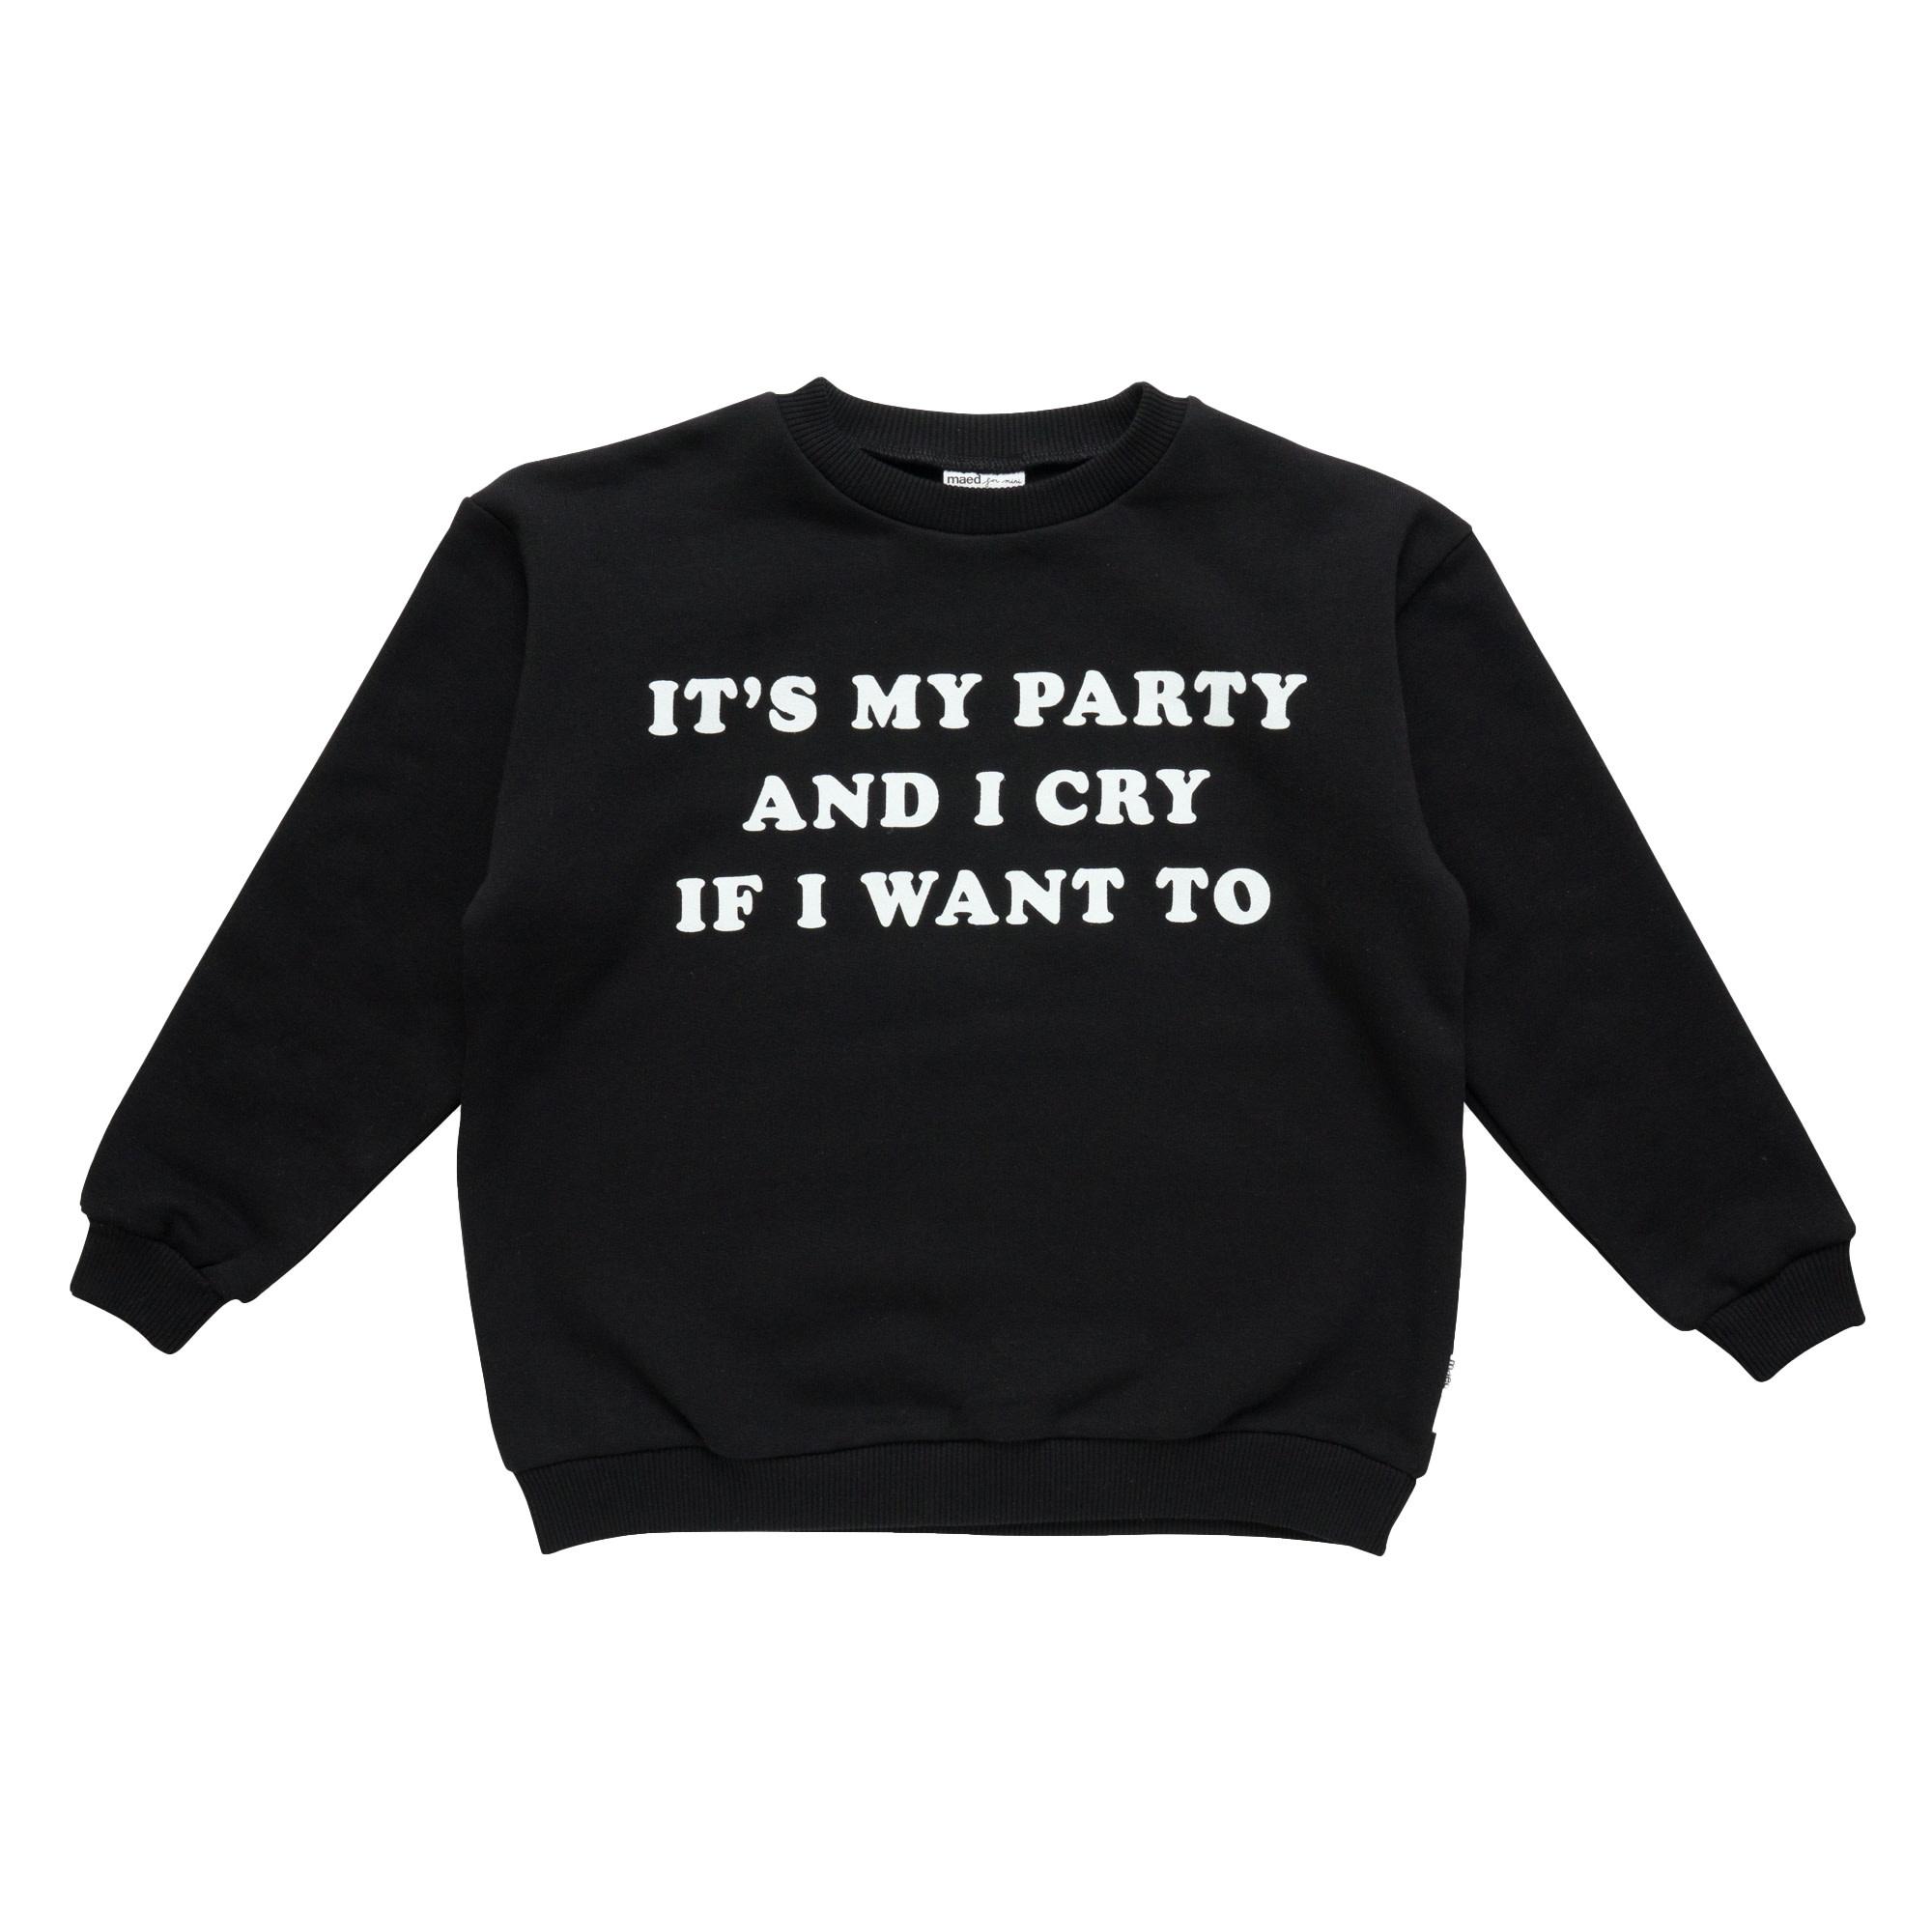 It's my party sweatshirt baby-1